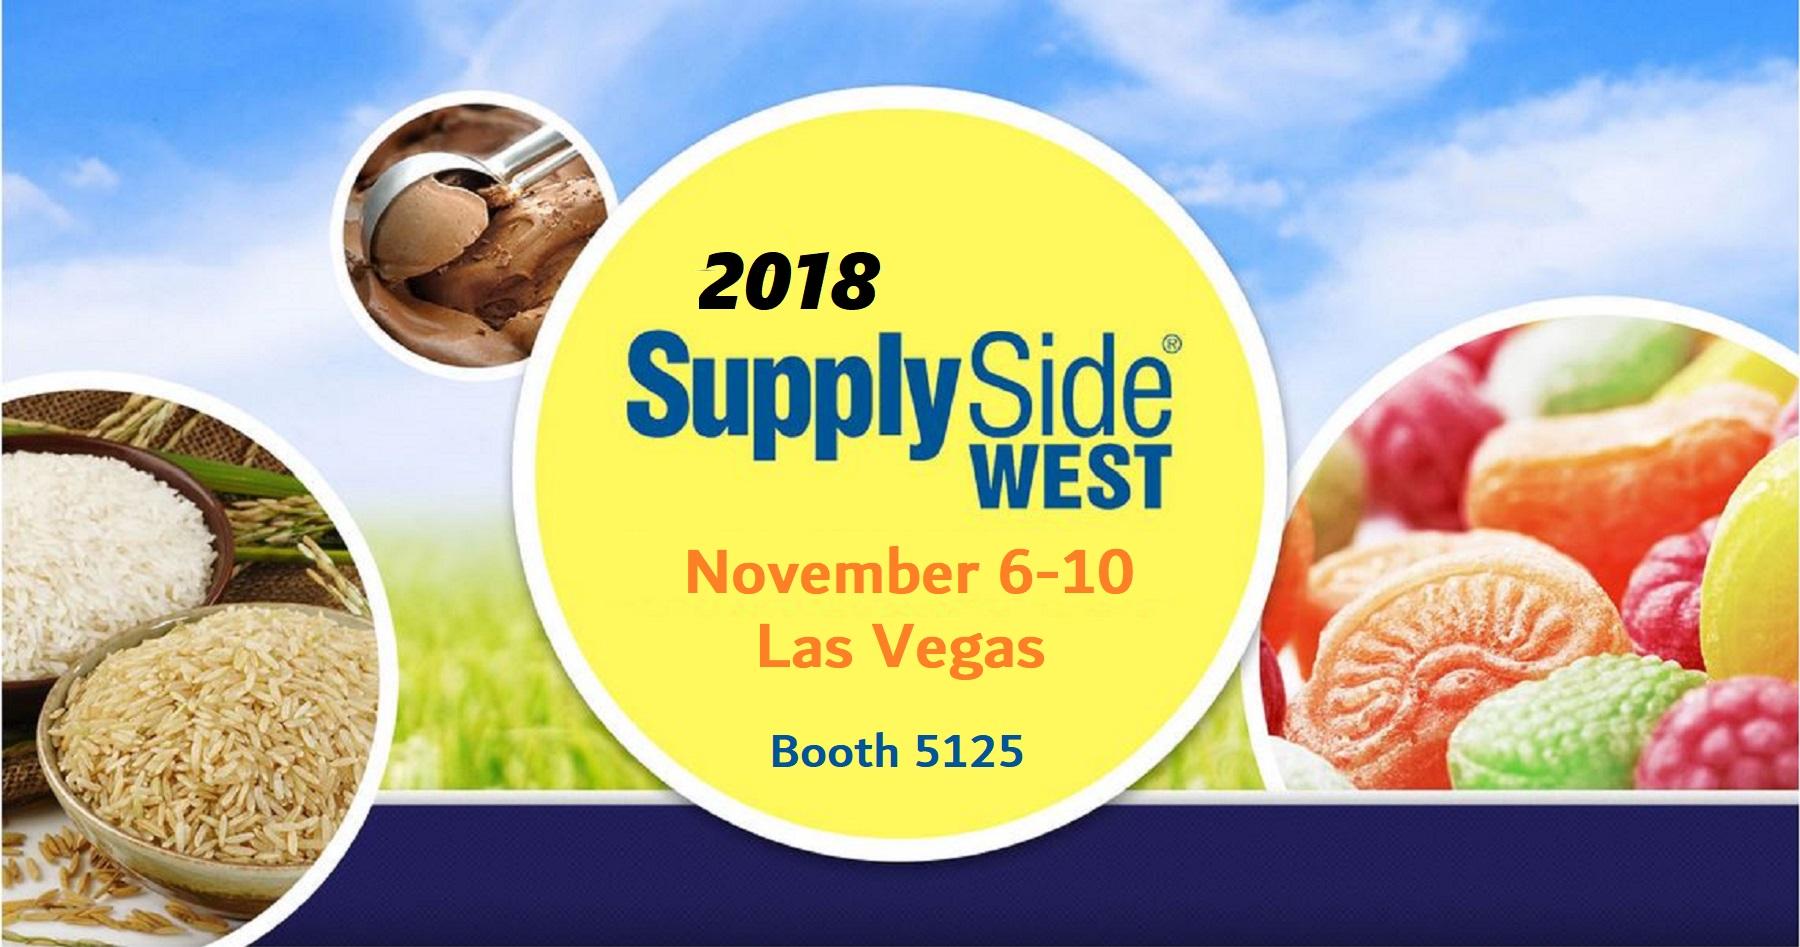 Supply Side West 2018 – Las Vegas – Nov. 6-10